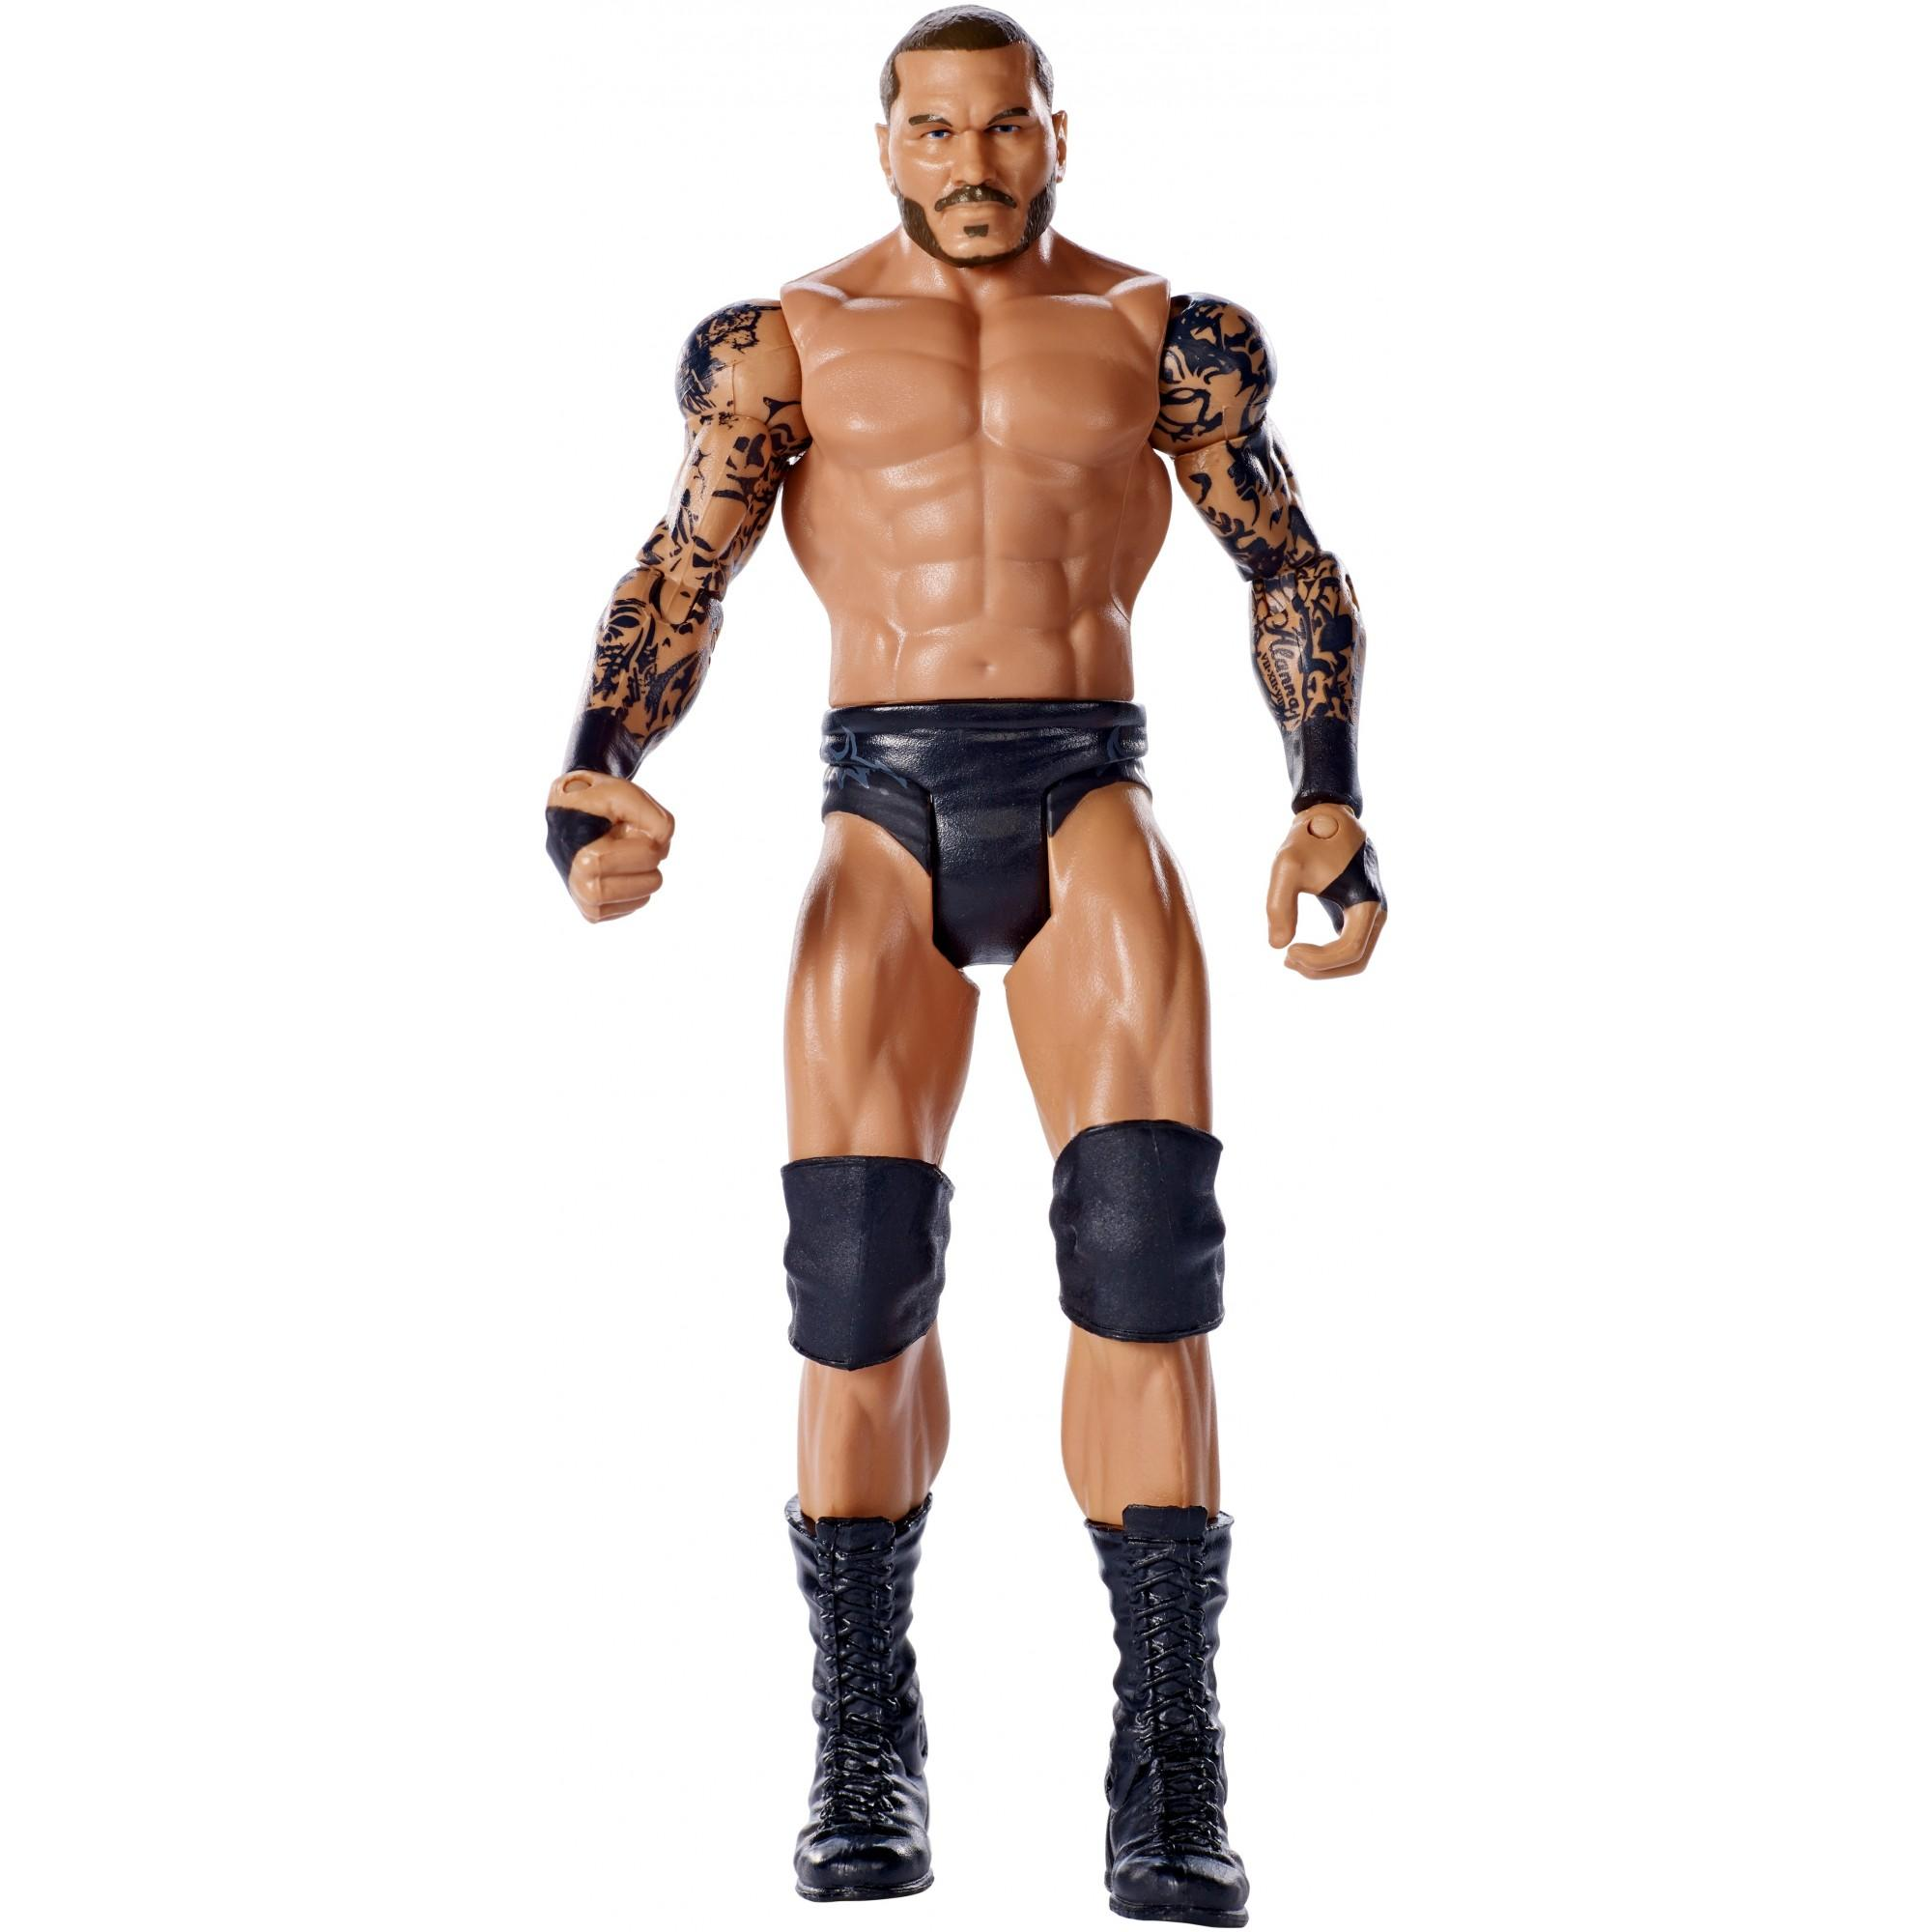 WWE Basic Randy Orton Figure by Mattel